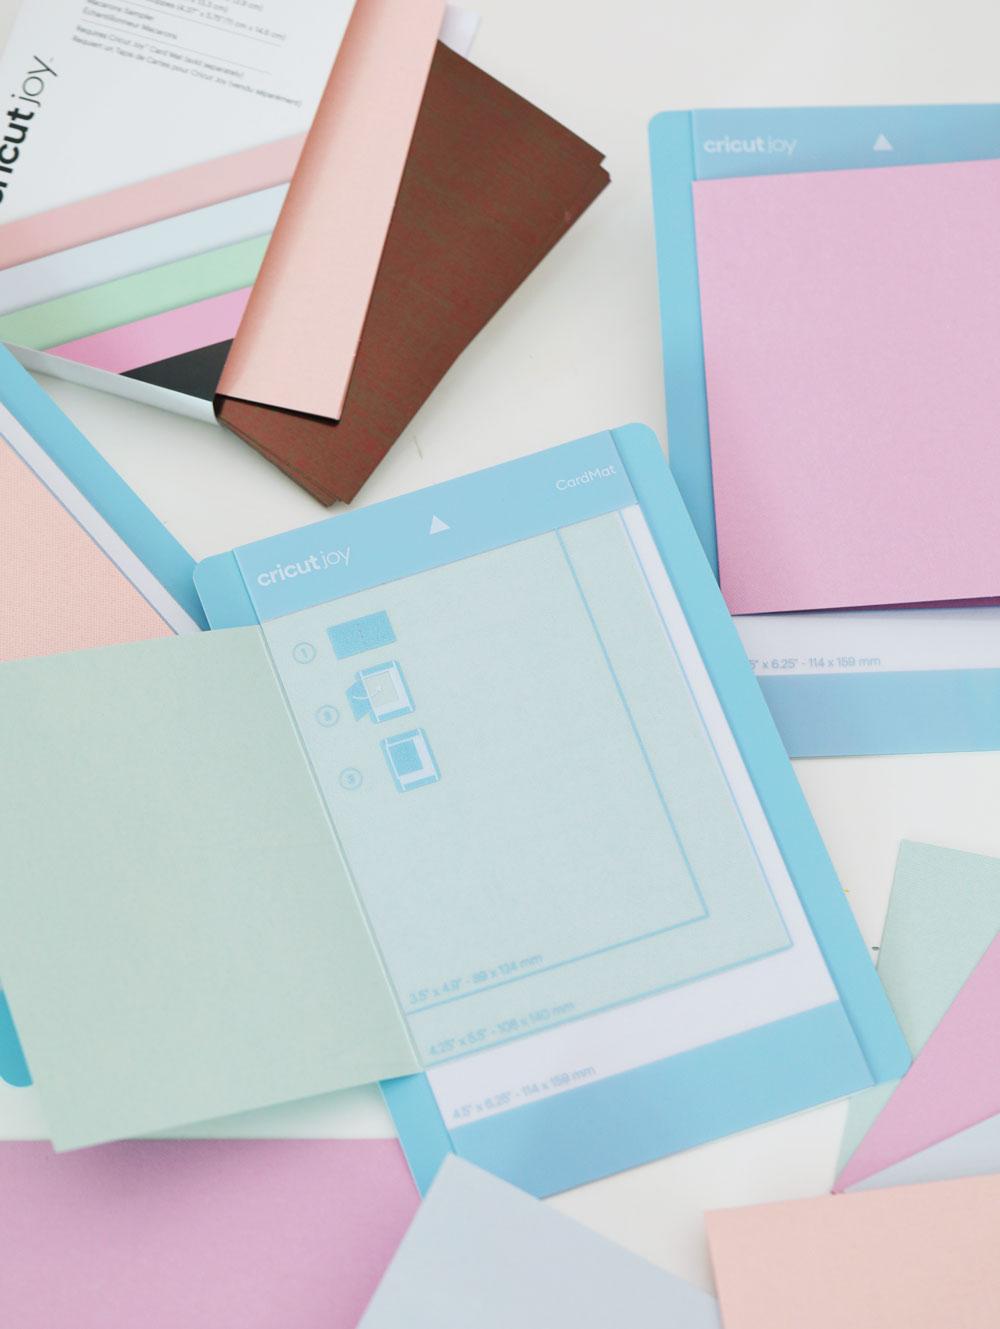 Googly Gooeys Free Printable Cricut Cut File Greeting Card Birthday Cake Valentines Ribbon